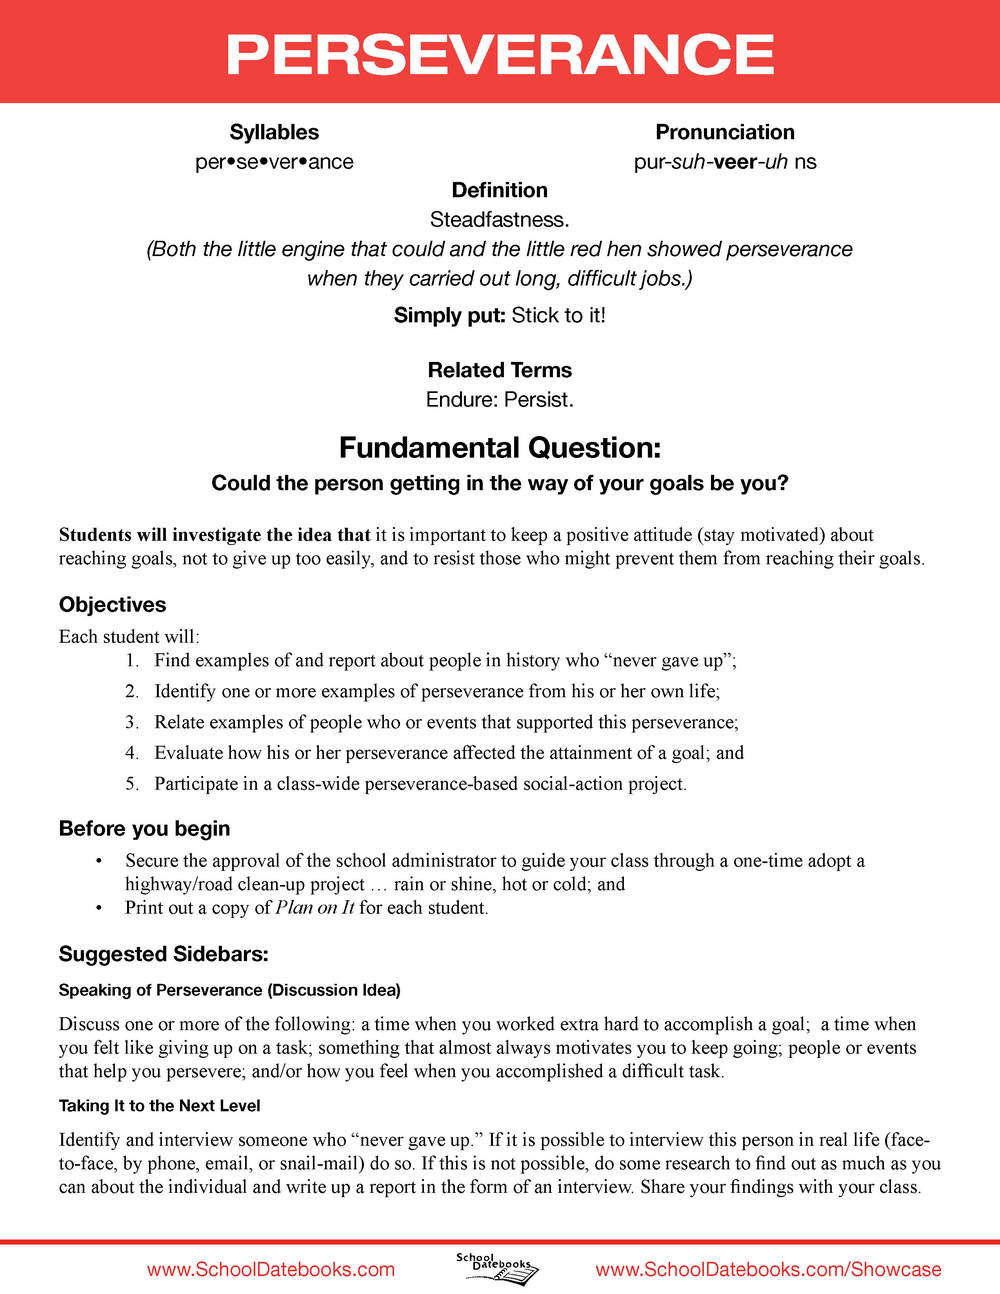 LessonPlan-Perseverance_Page_1.jpg